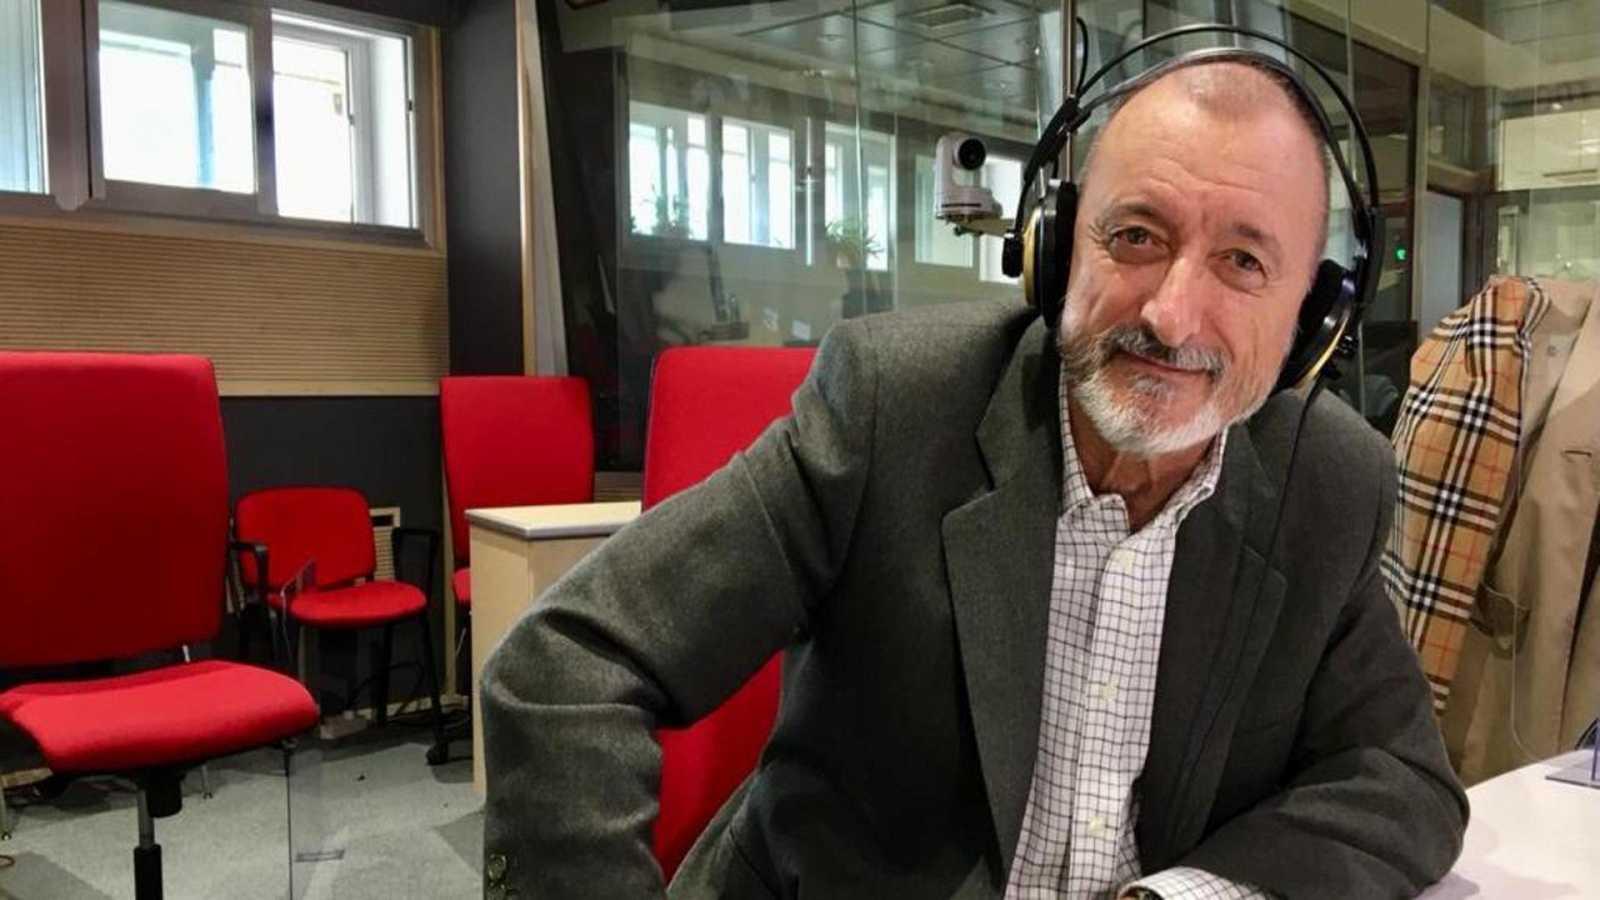 Las mañanas de RNE con Pepa Fernández - Arturo Pérez-Reverte - Escuchar ahora